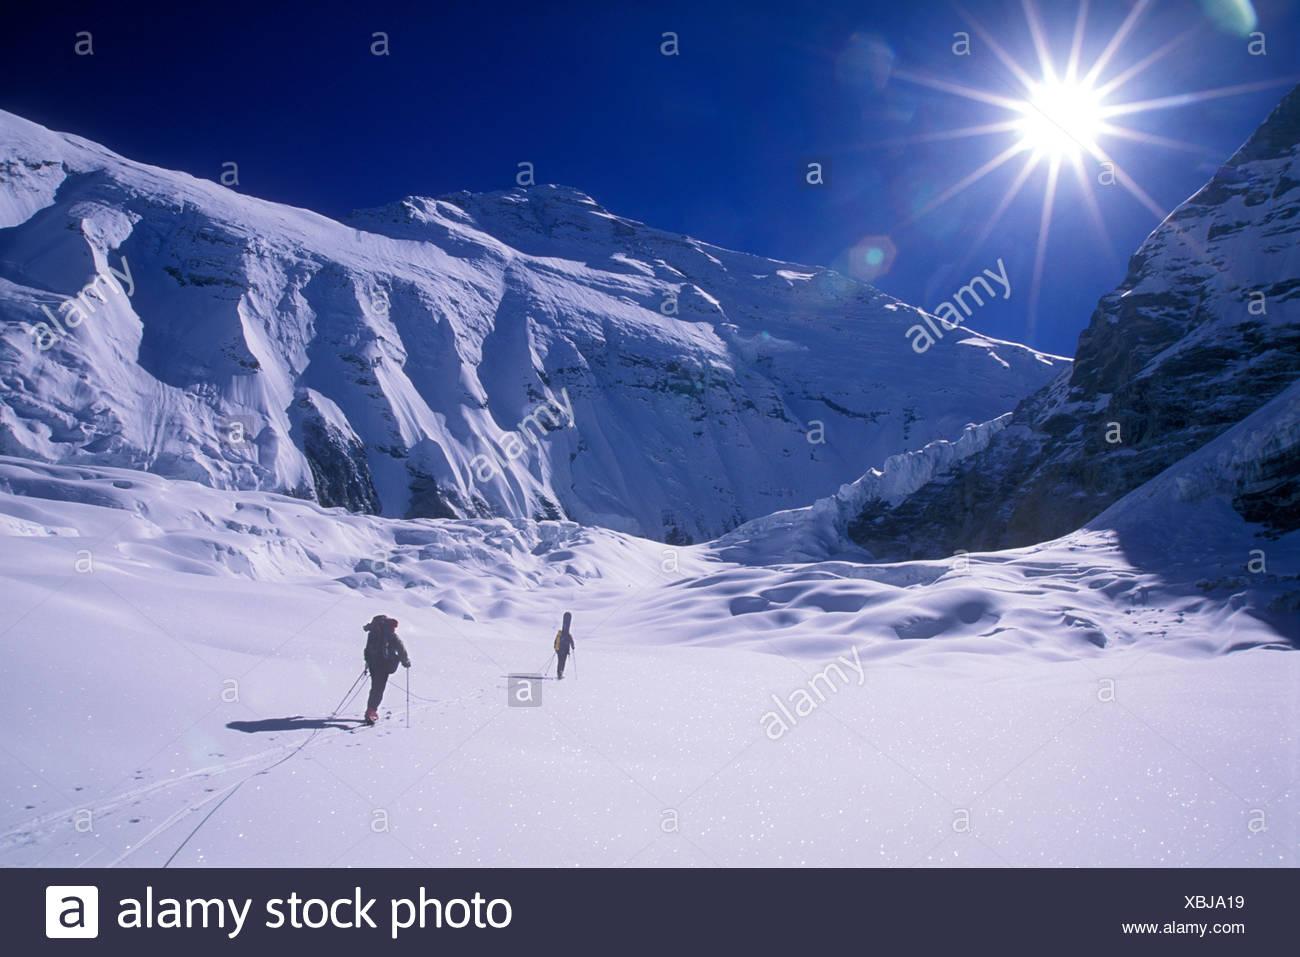 Two men ski touring up the Central Rongbuk Glacier towards Mount Everest - Stock Image